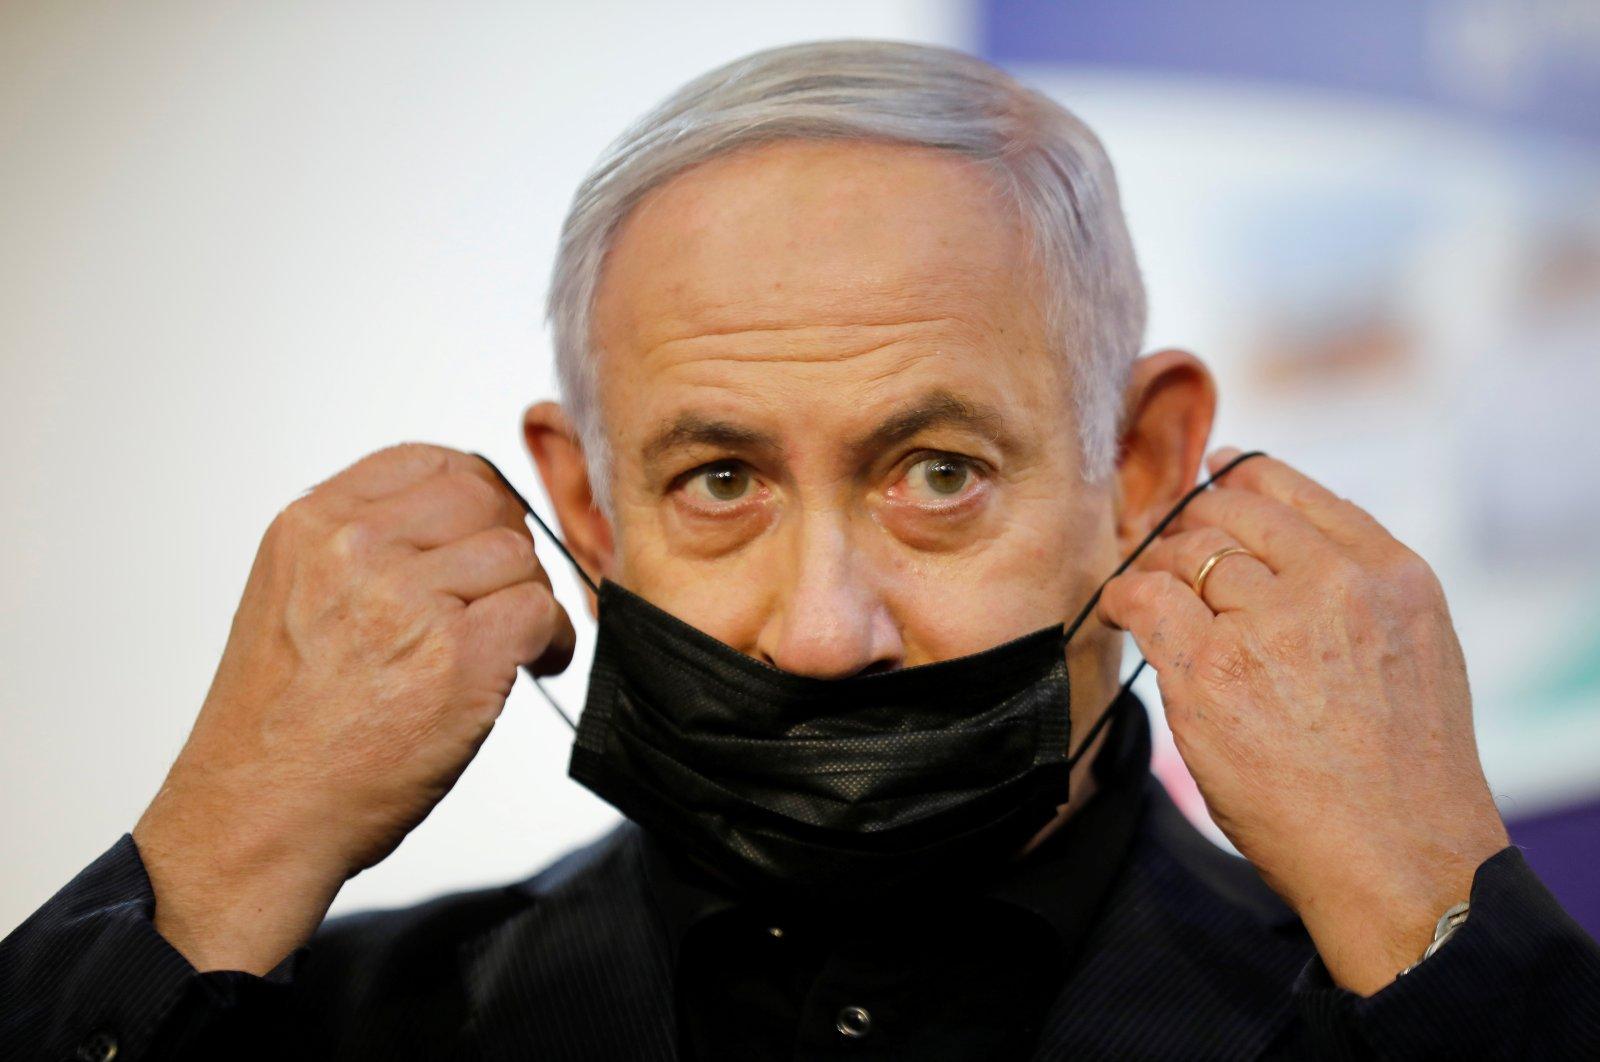 Israeli Prime Minister Benjamin Netanyahu adjusts his protective face mask after receiving a coronavirus vaccine at Sheba Medical Center in Ramat Gan, Israel, on Dec. 19, 2020. (Reuters File Photo)